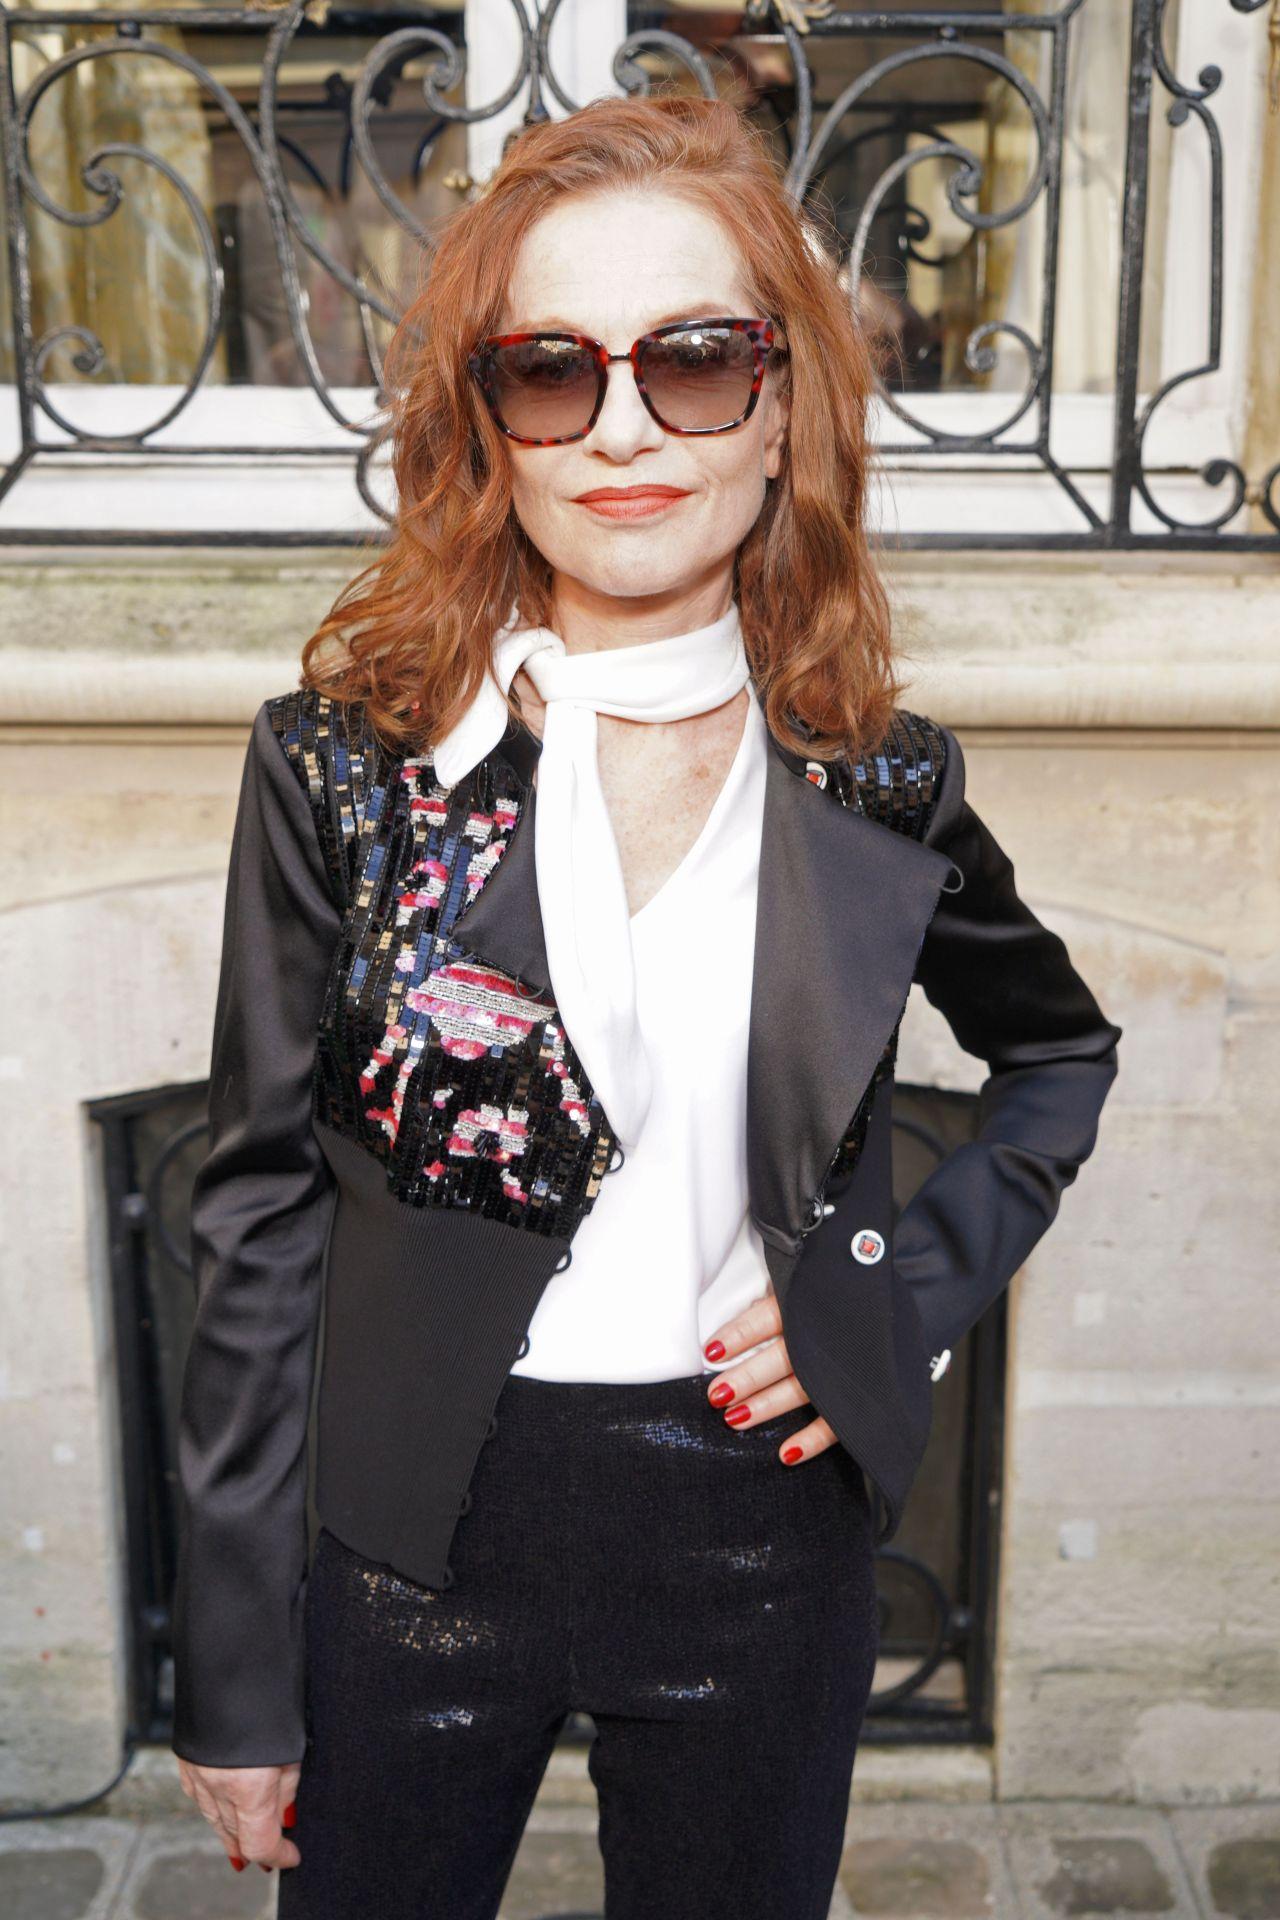 https://celebmafia.com/wp-content/uploads/2018/07/isabelle-huppert-giorgio-armani-prive-fashion-show-in-paris-07-03-2018-5.jpg